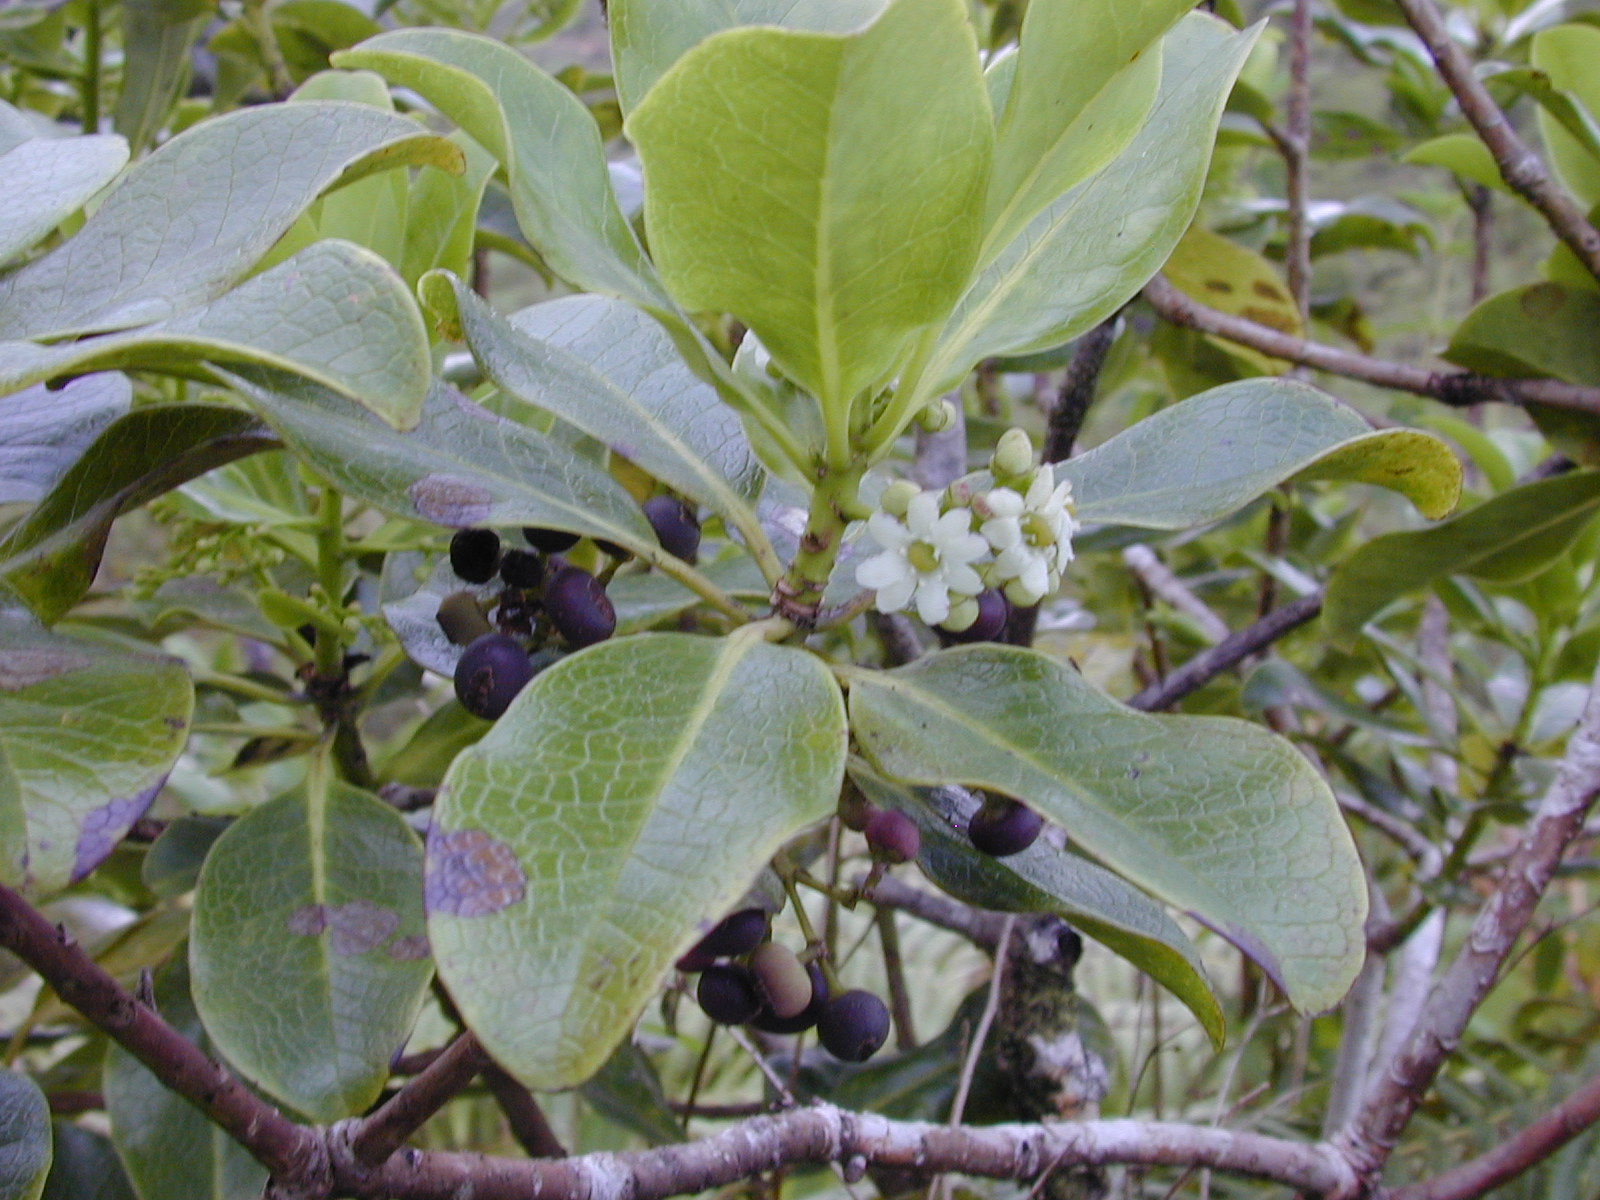 Flowering Plant Identification